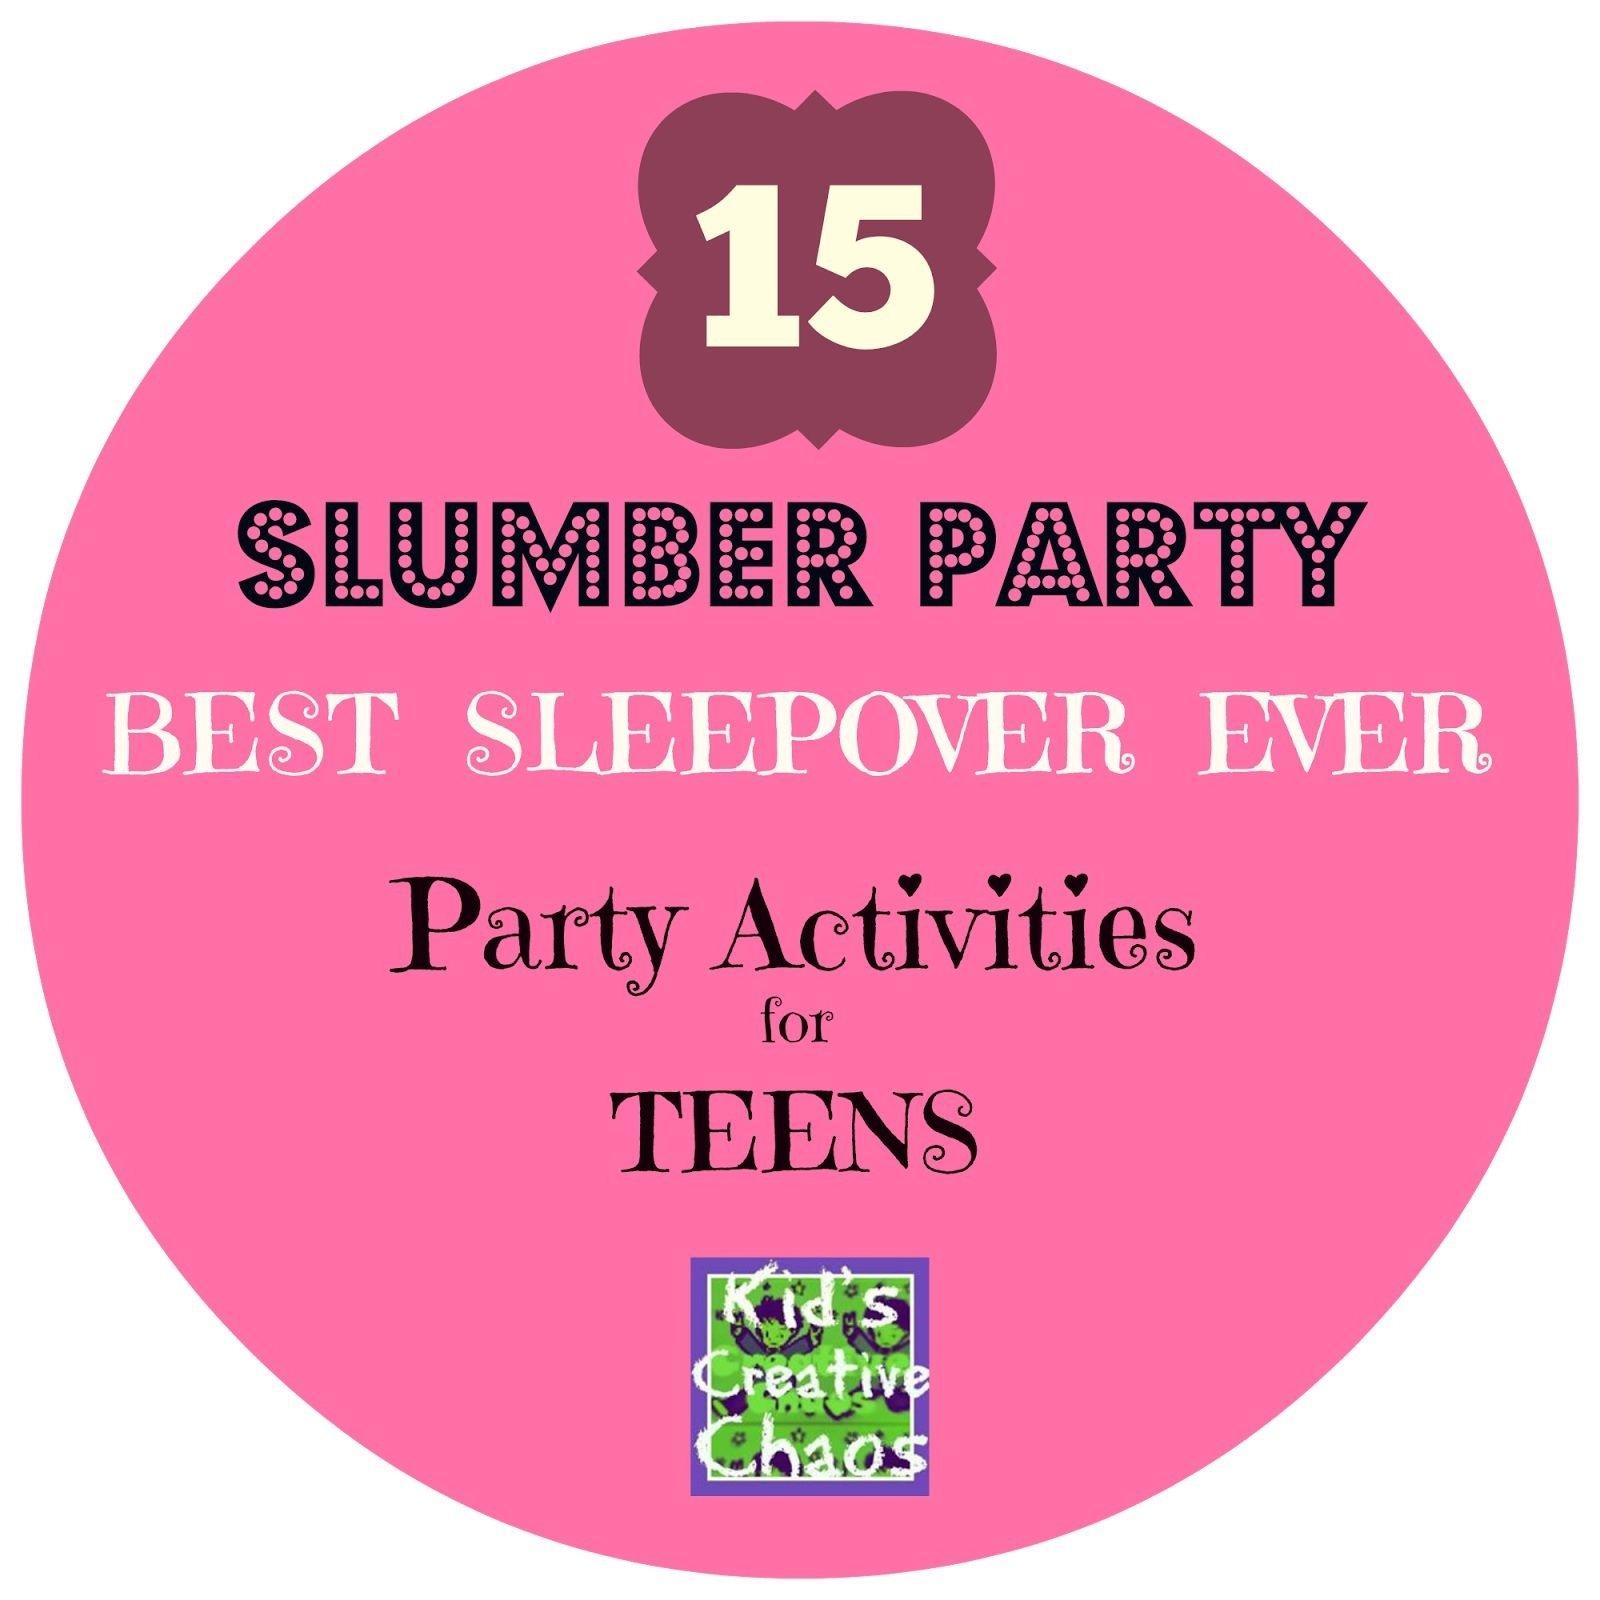 10 Stunning Sleepover Ideas For Teenage Girls image from http 4 bp blogspot 7jcni0mf1mw u31ca wdsri 2021